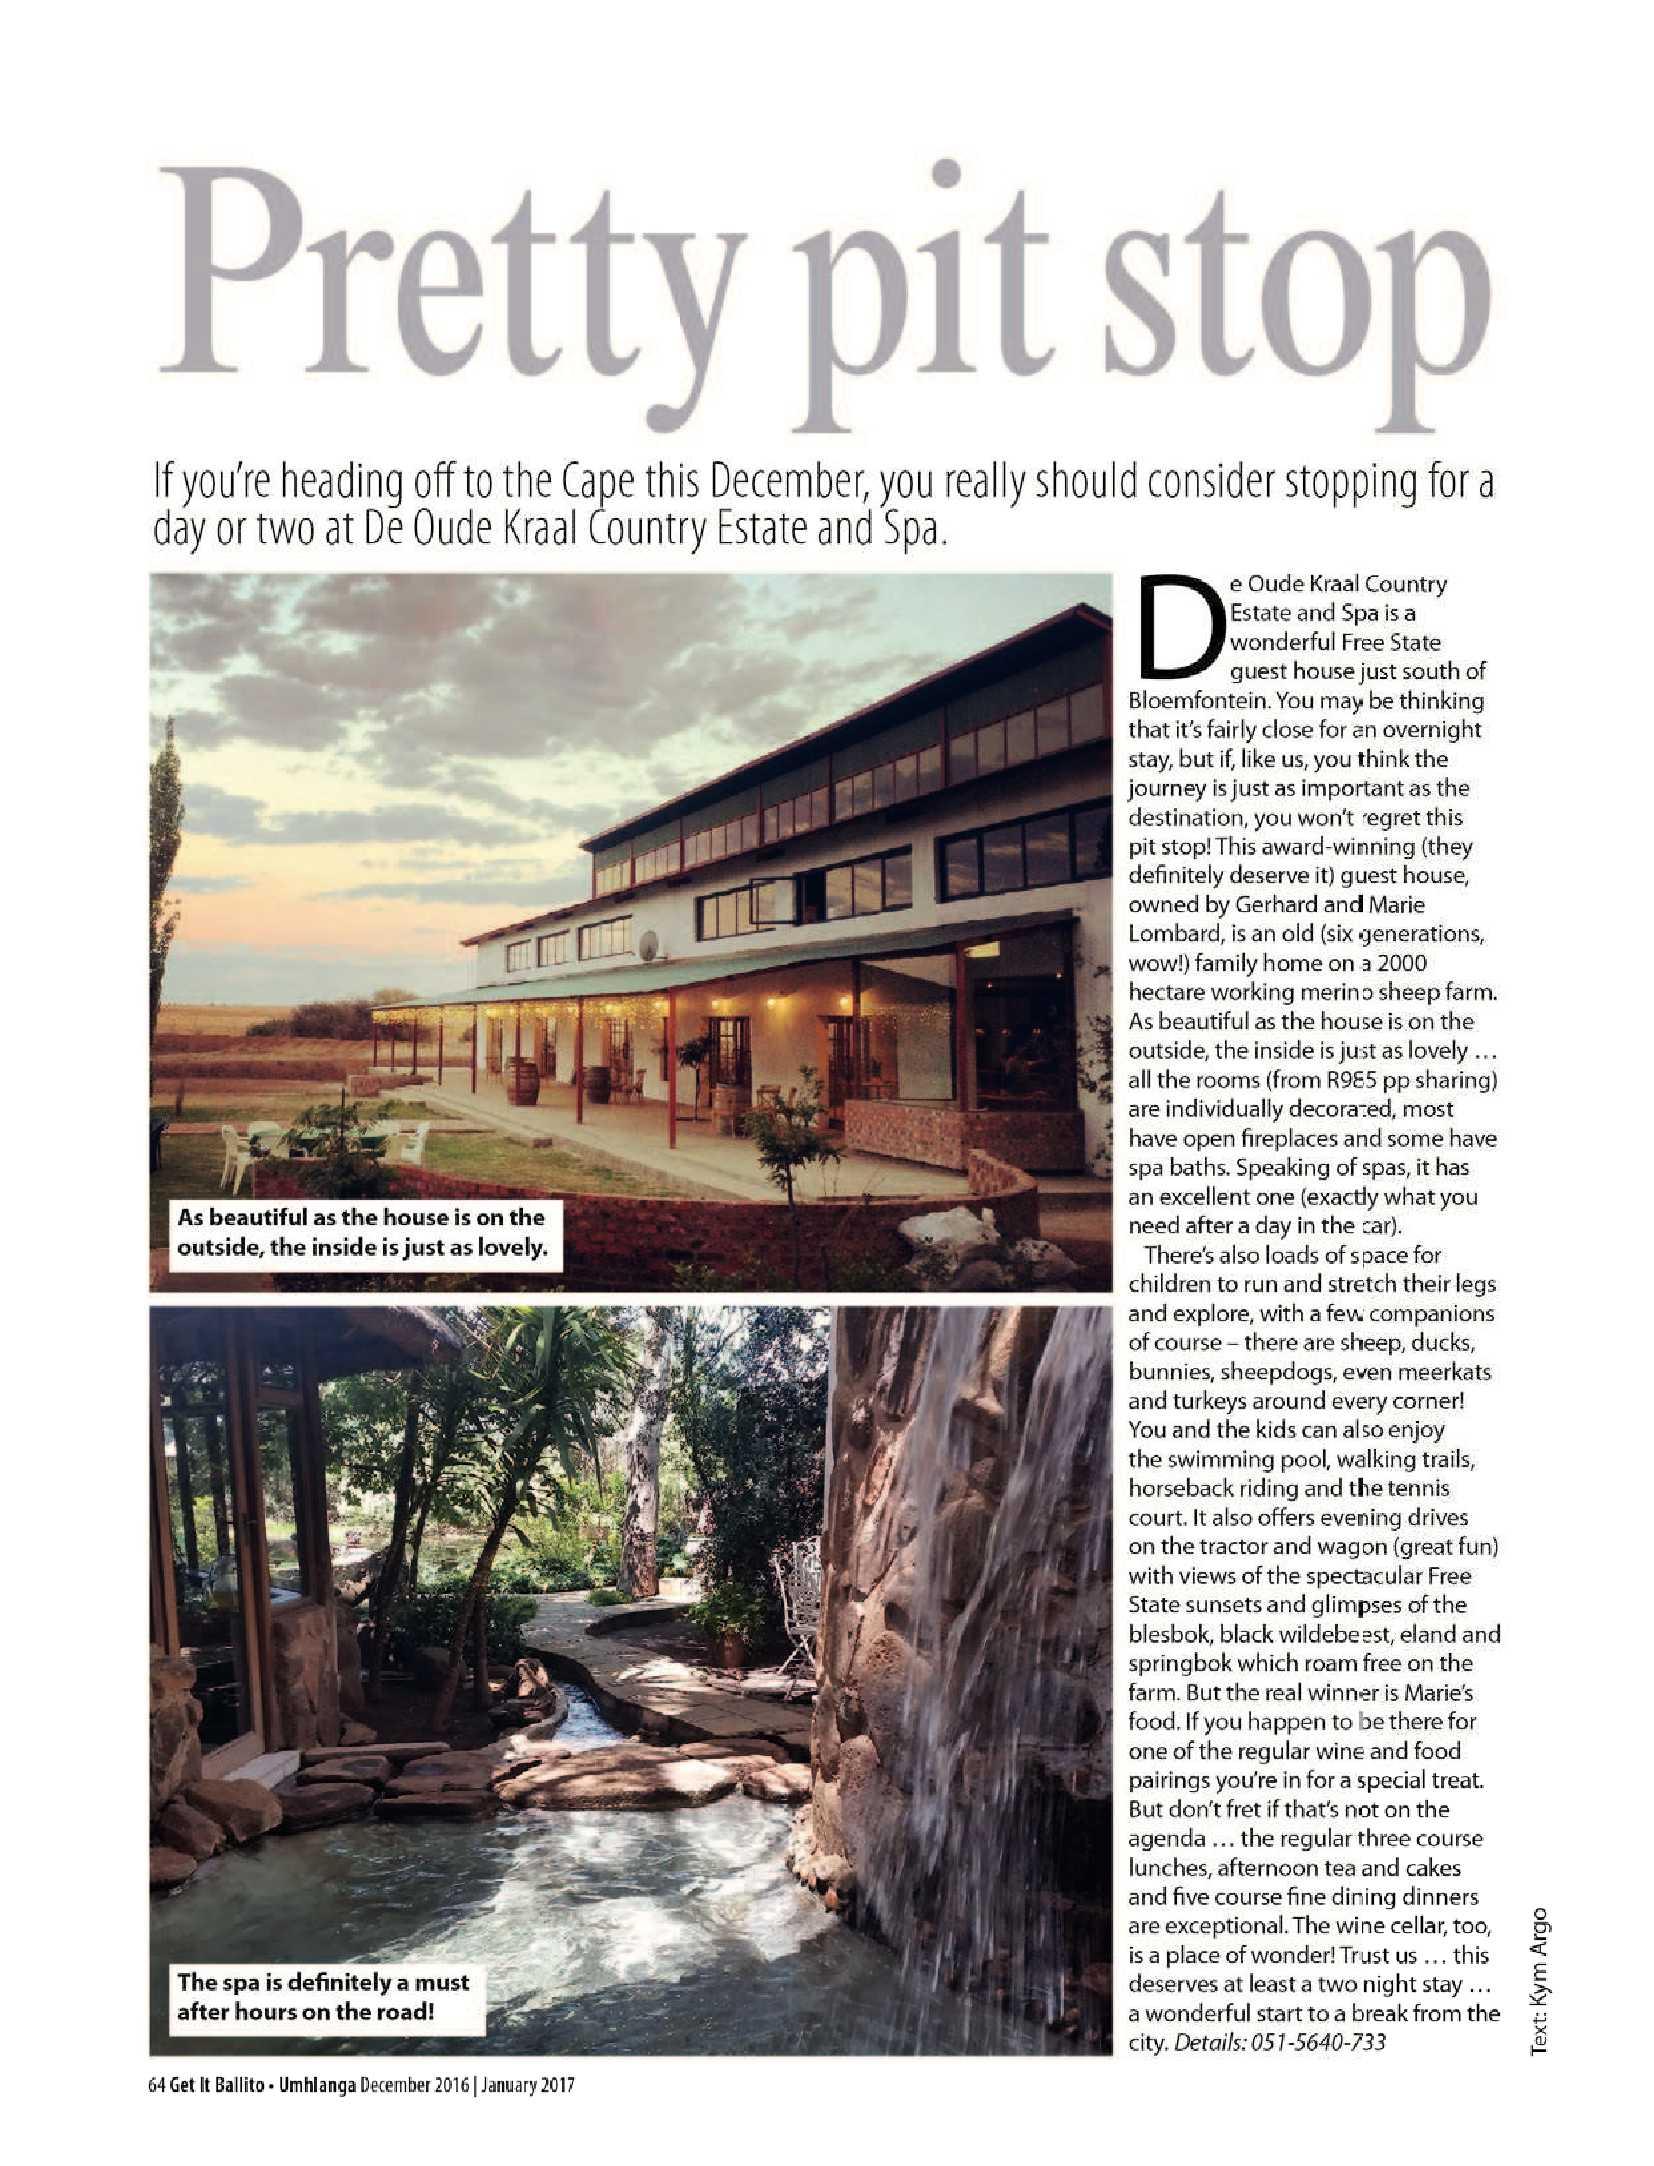 get-magazine-ballitoumhlanga-december-2016-january-2017-epapers-page-66